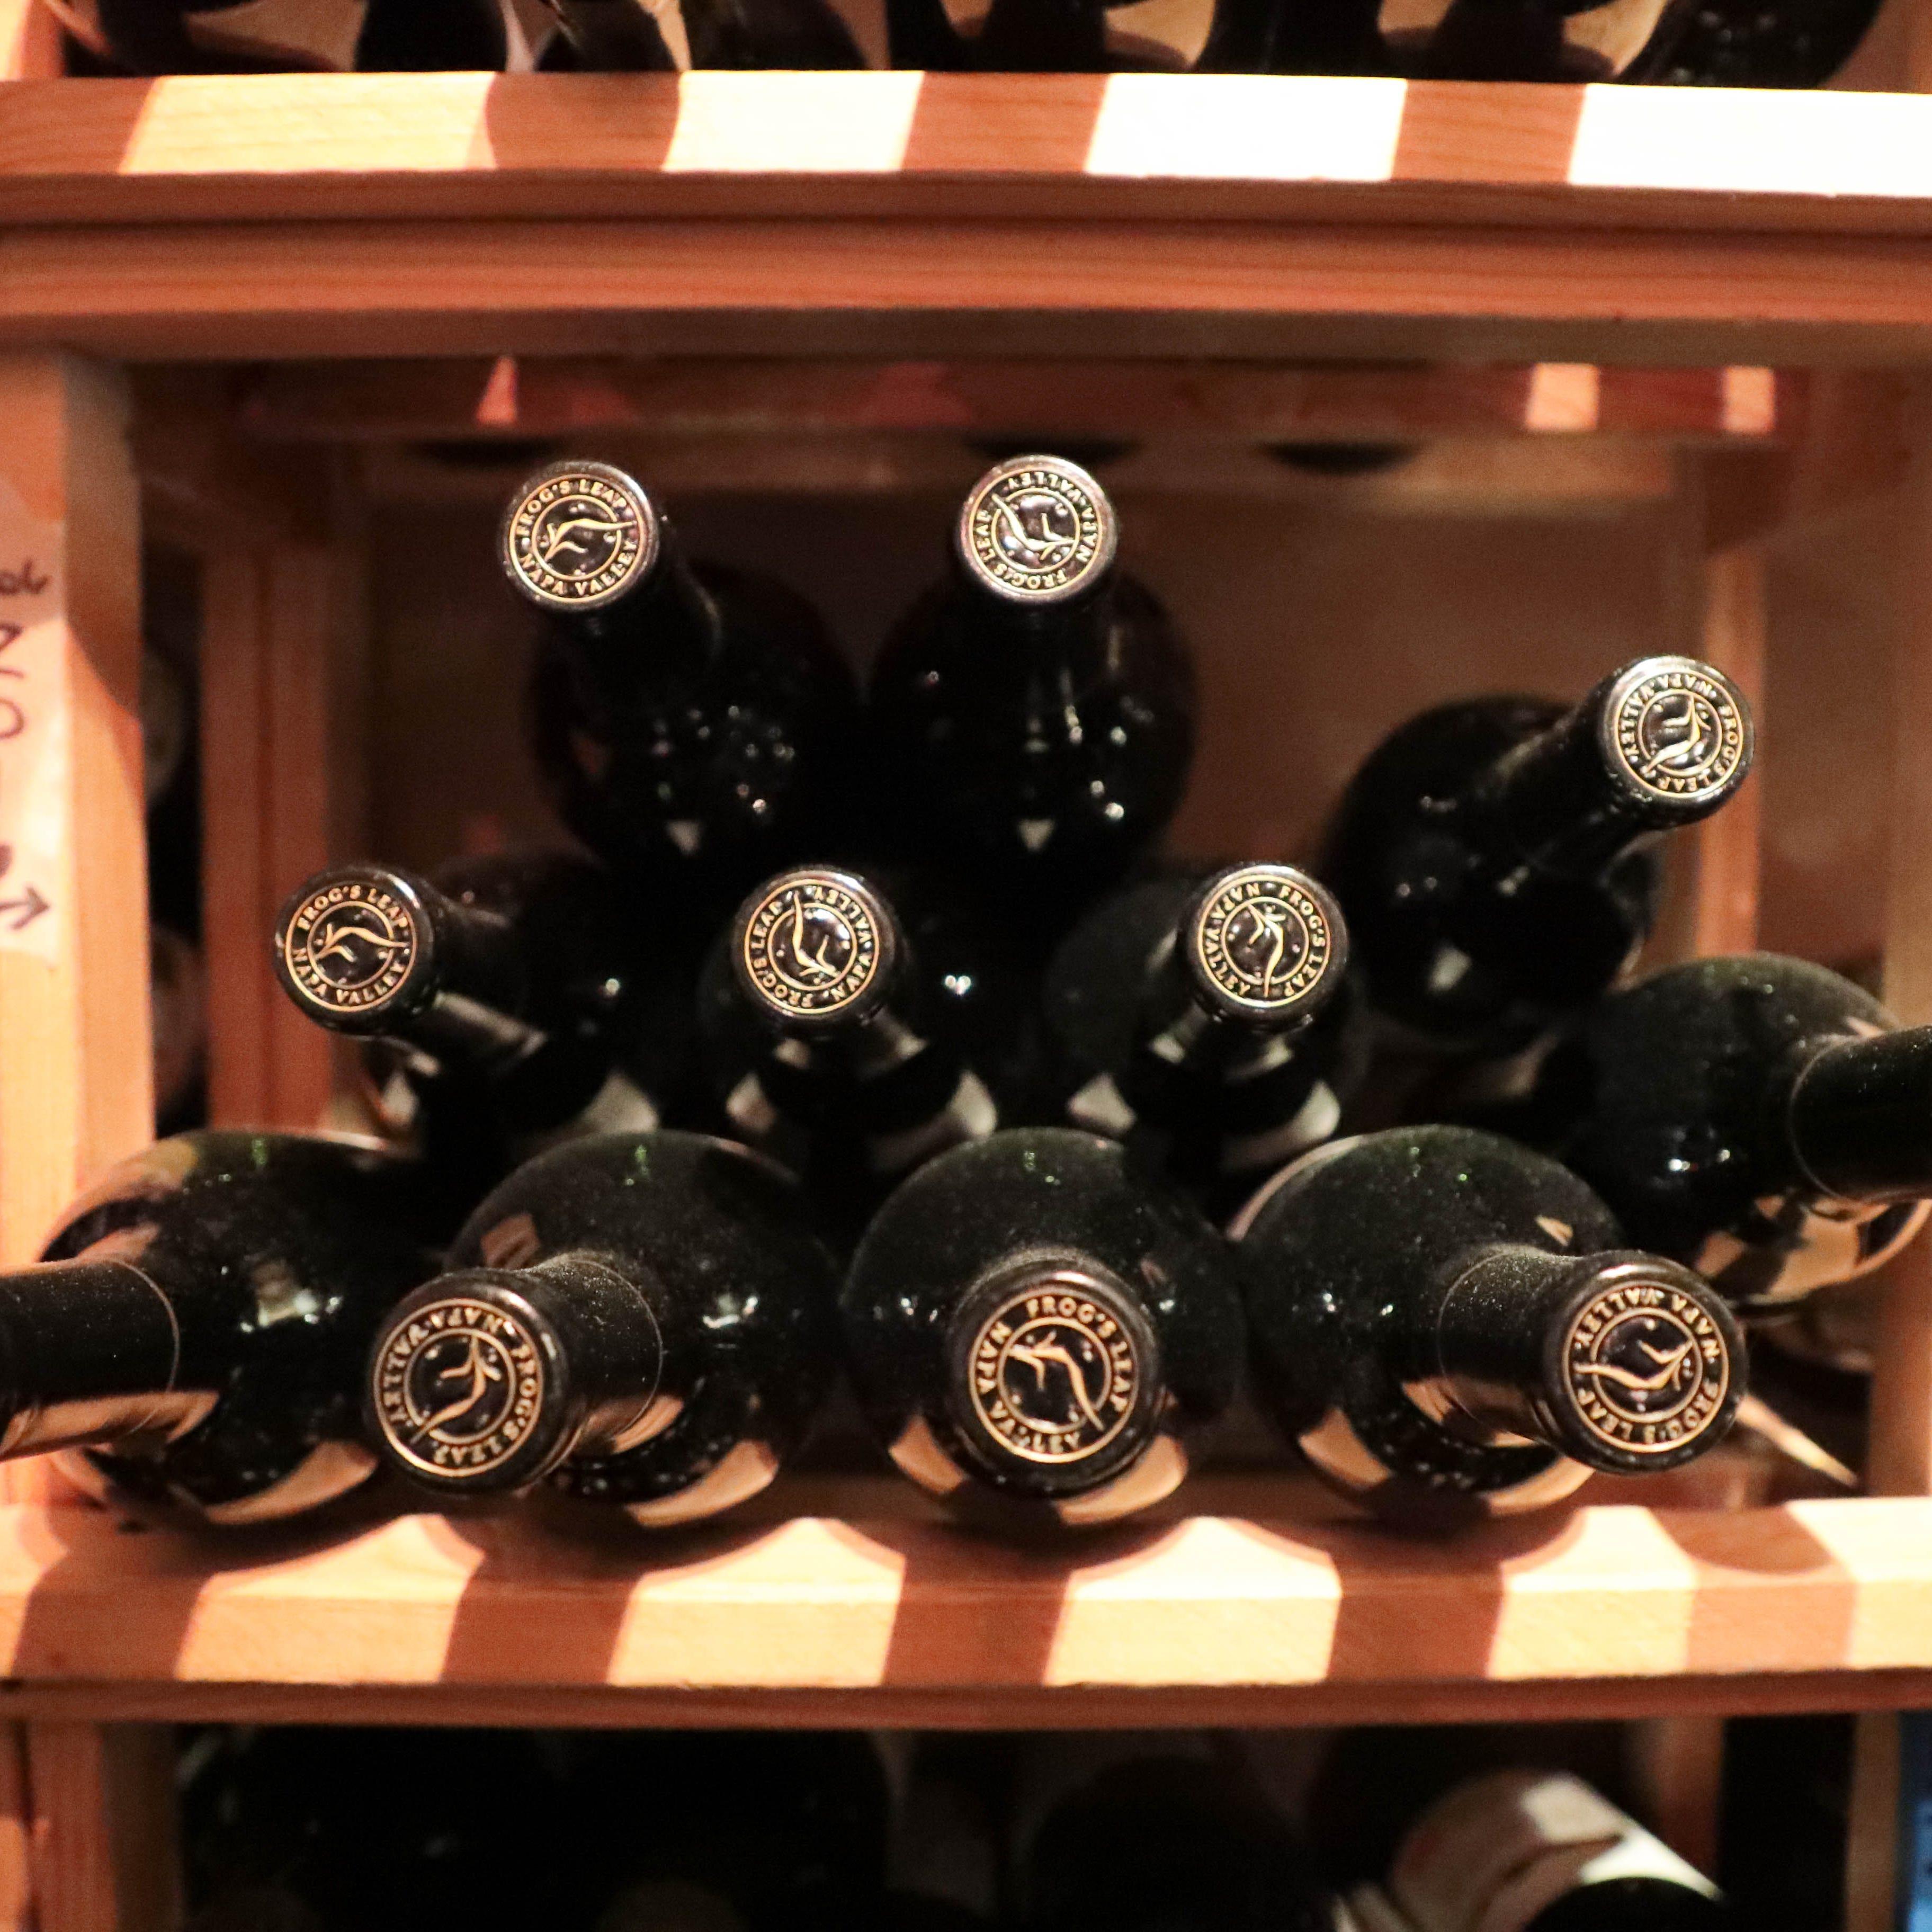 Wine + desert = complicated.